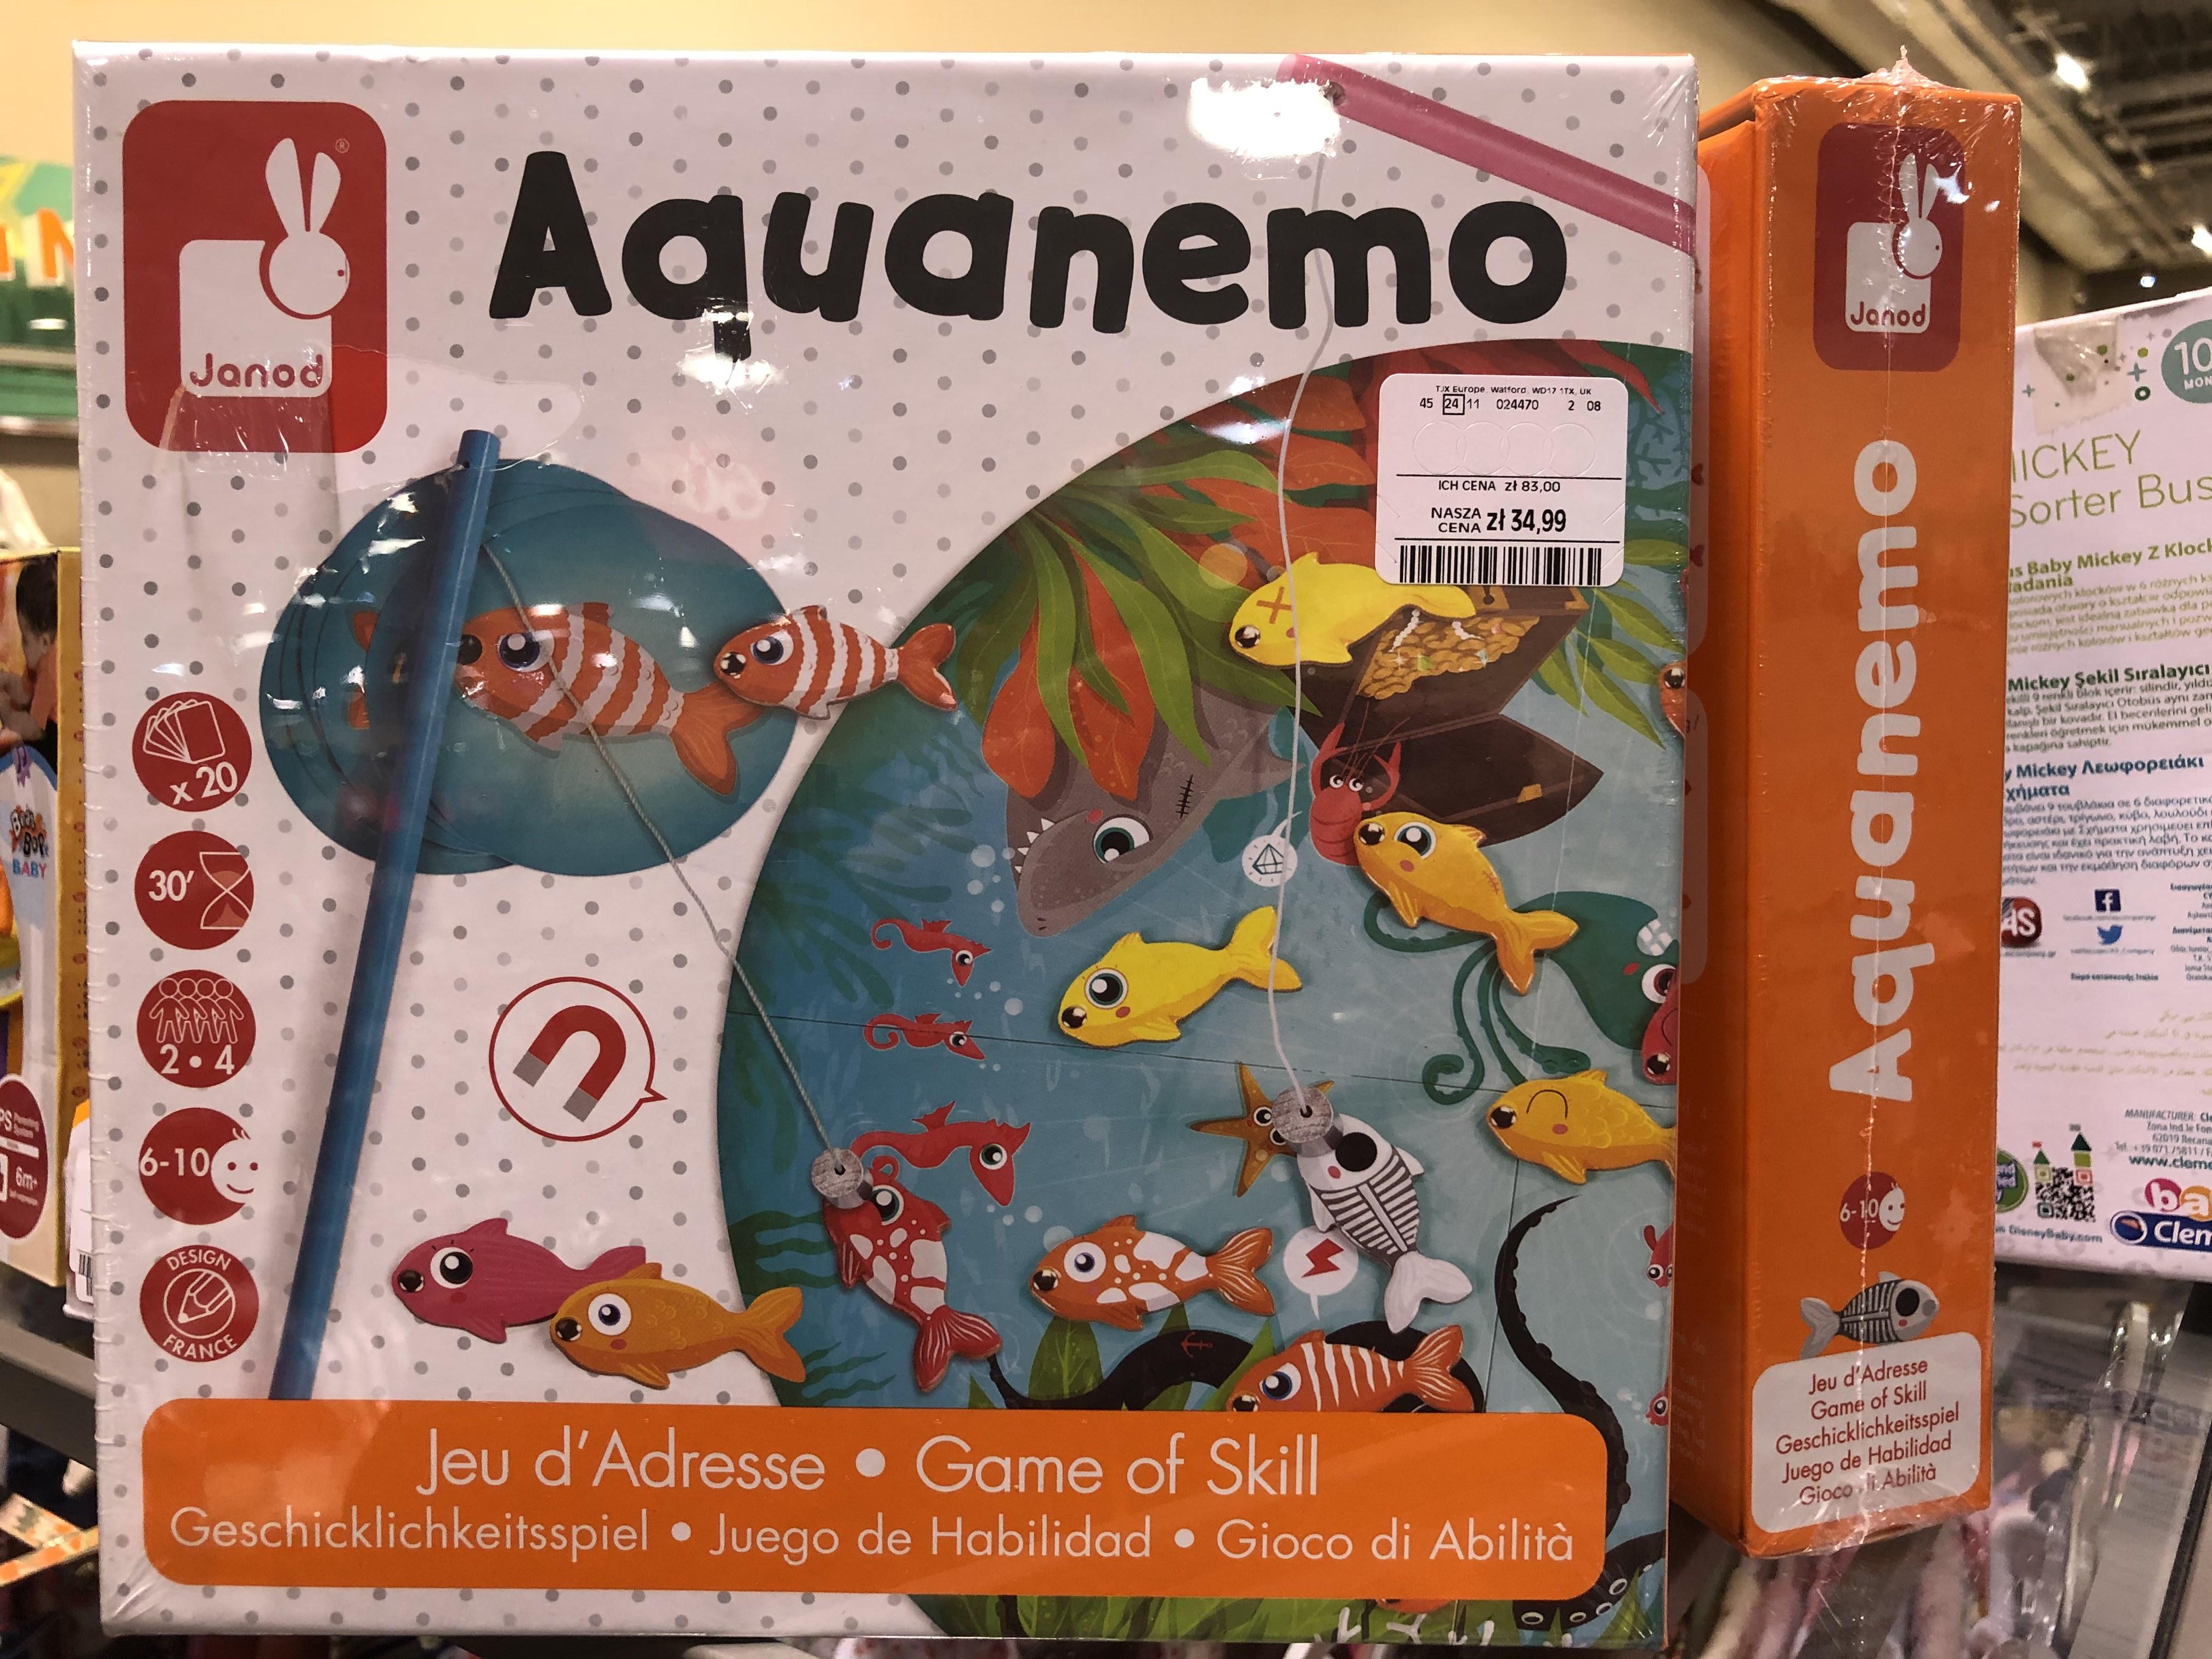 Aquanemo (Janod)